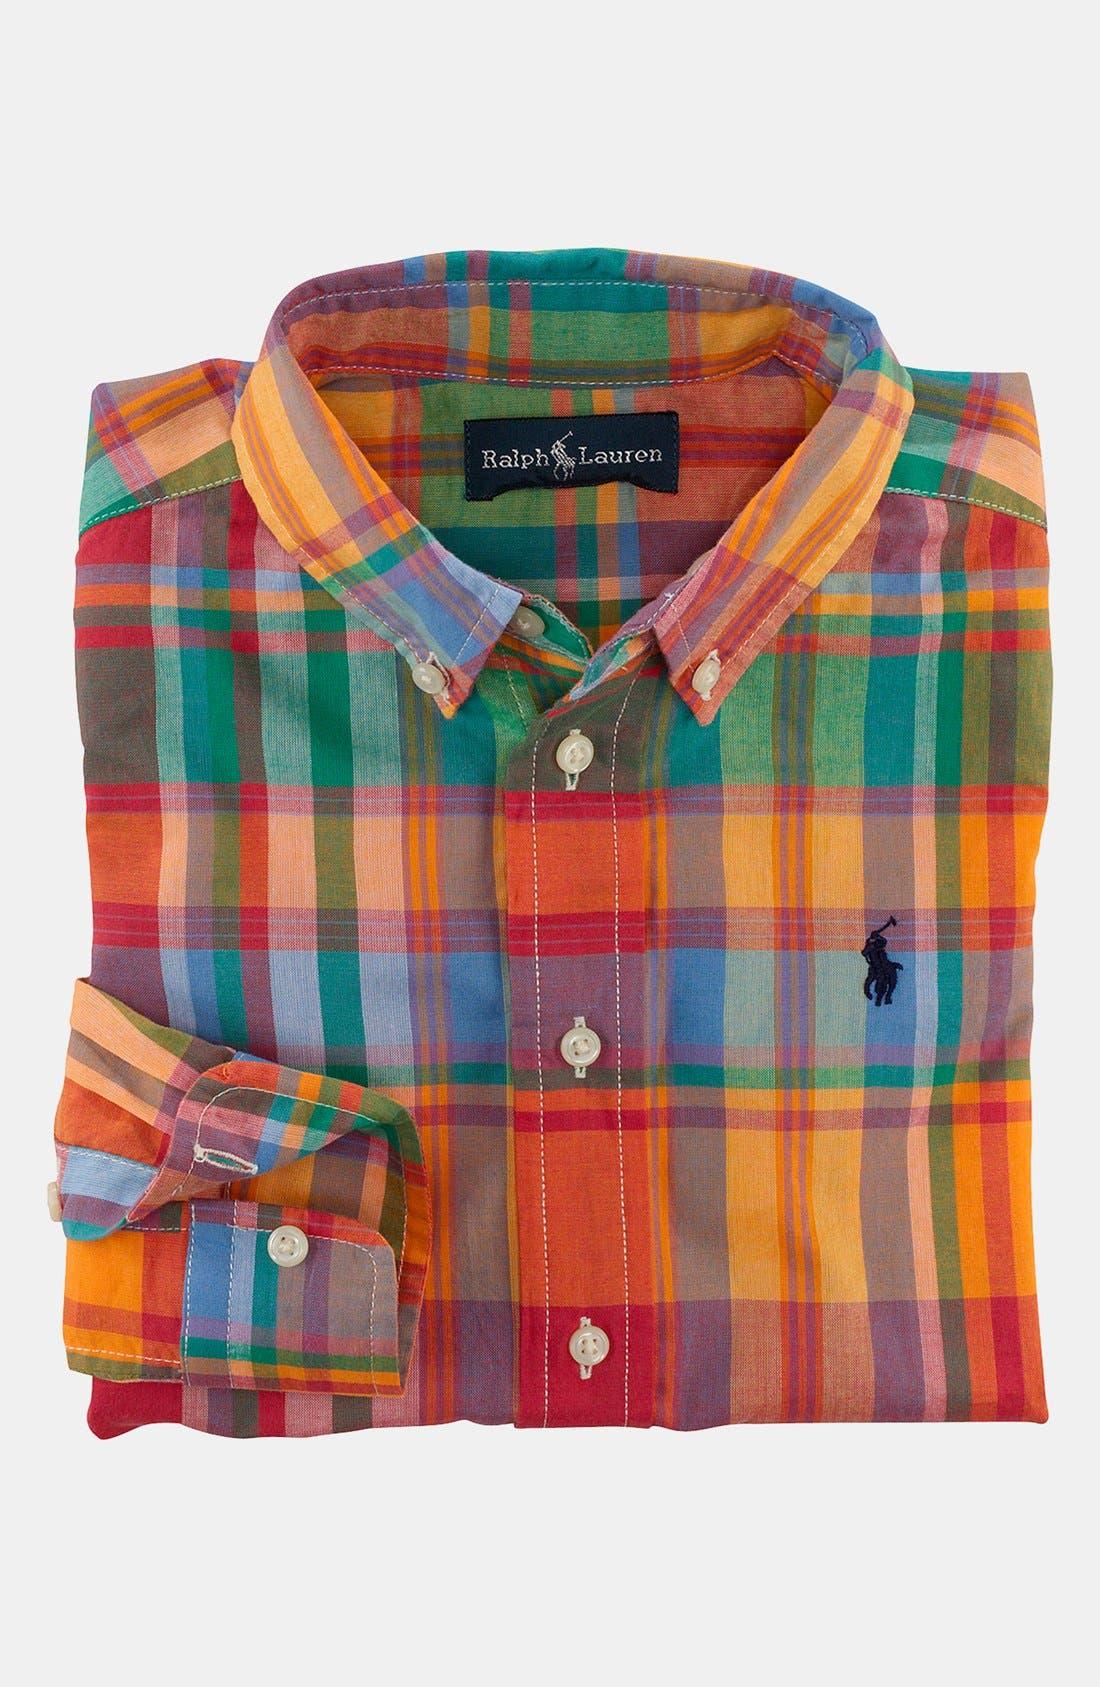 Alternate Image 1 Selected - Ralph Lauren Sport Shirt (Toddler)